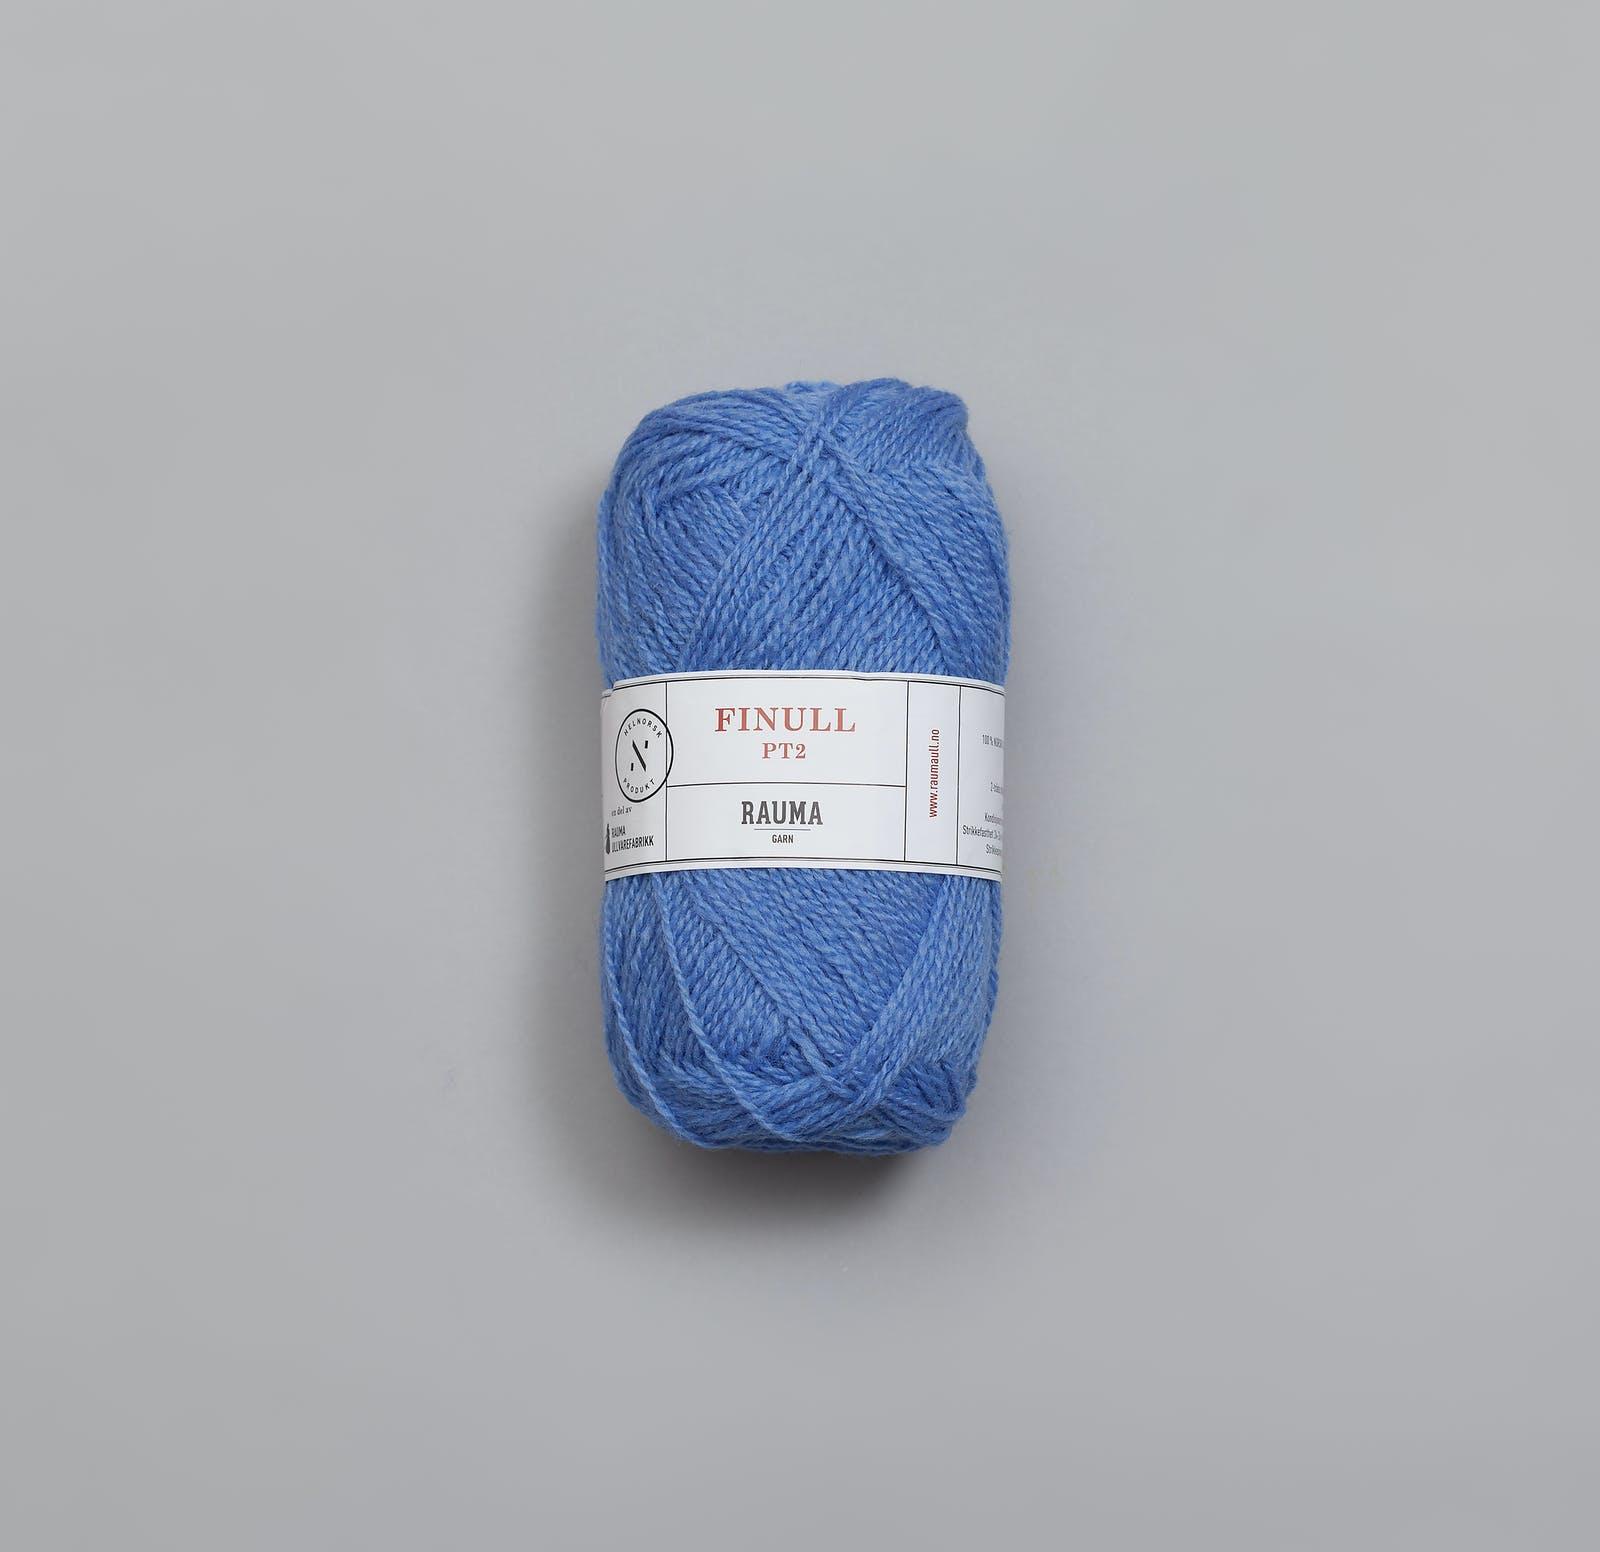 Finullgarn Pt2 - 4385 Helles Jeansblau / Lys jeansblå